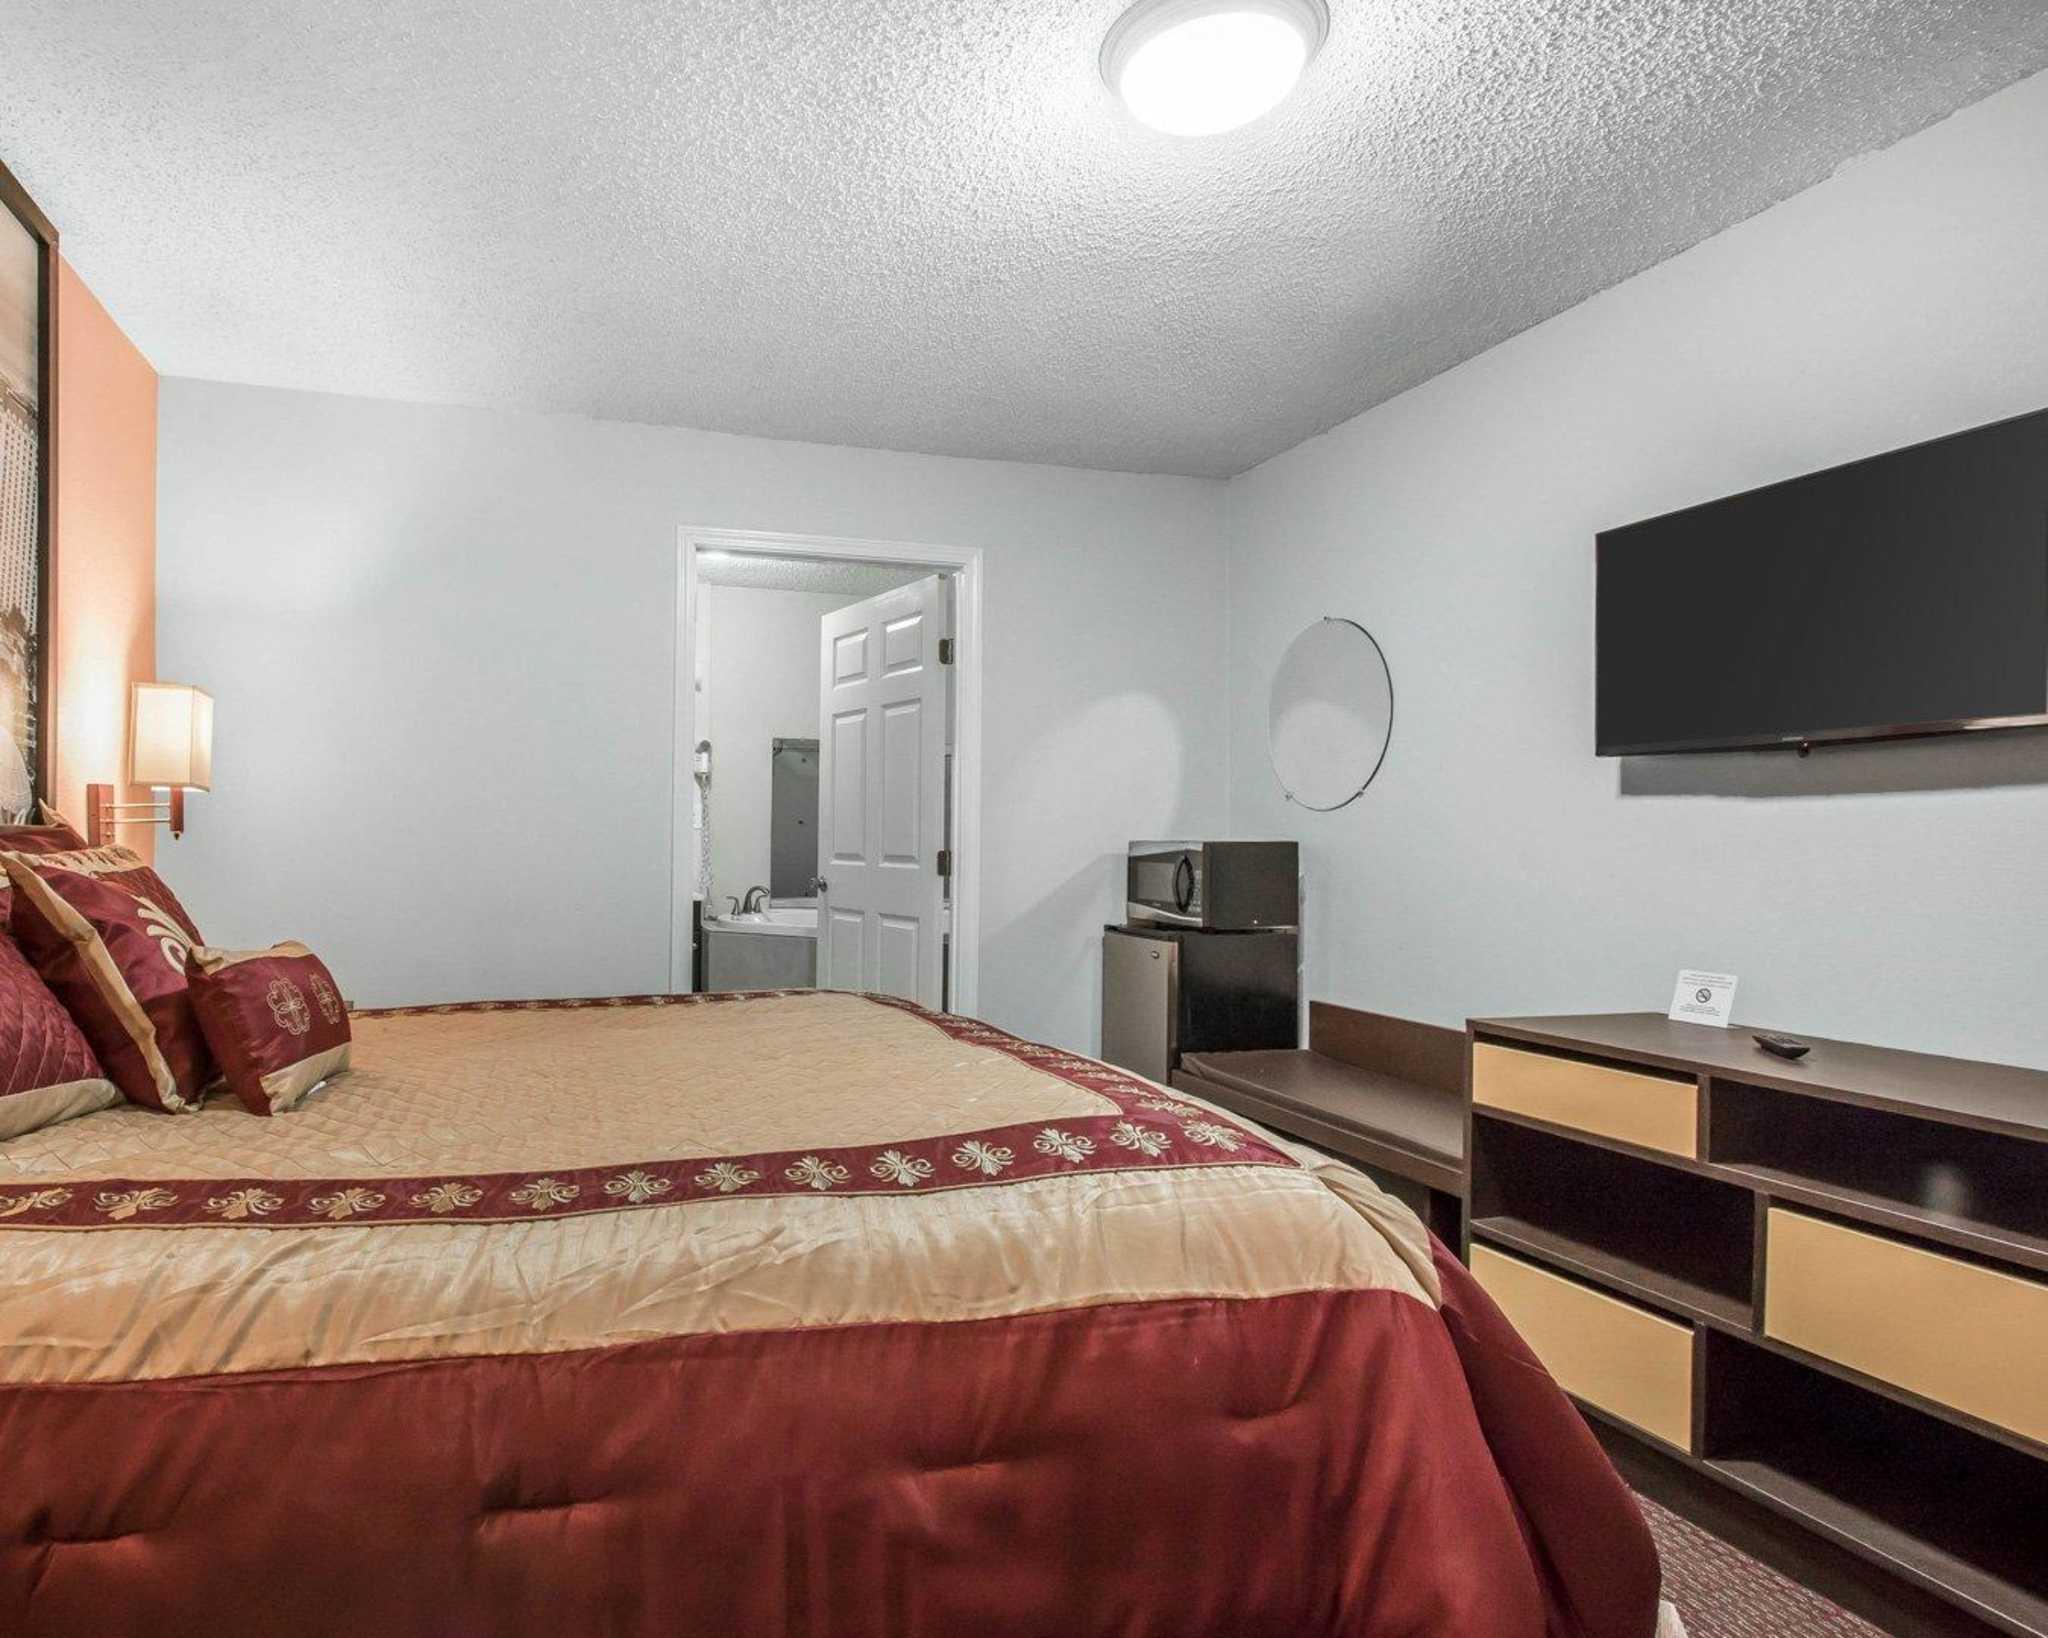 Rodeway Inn image 25